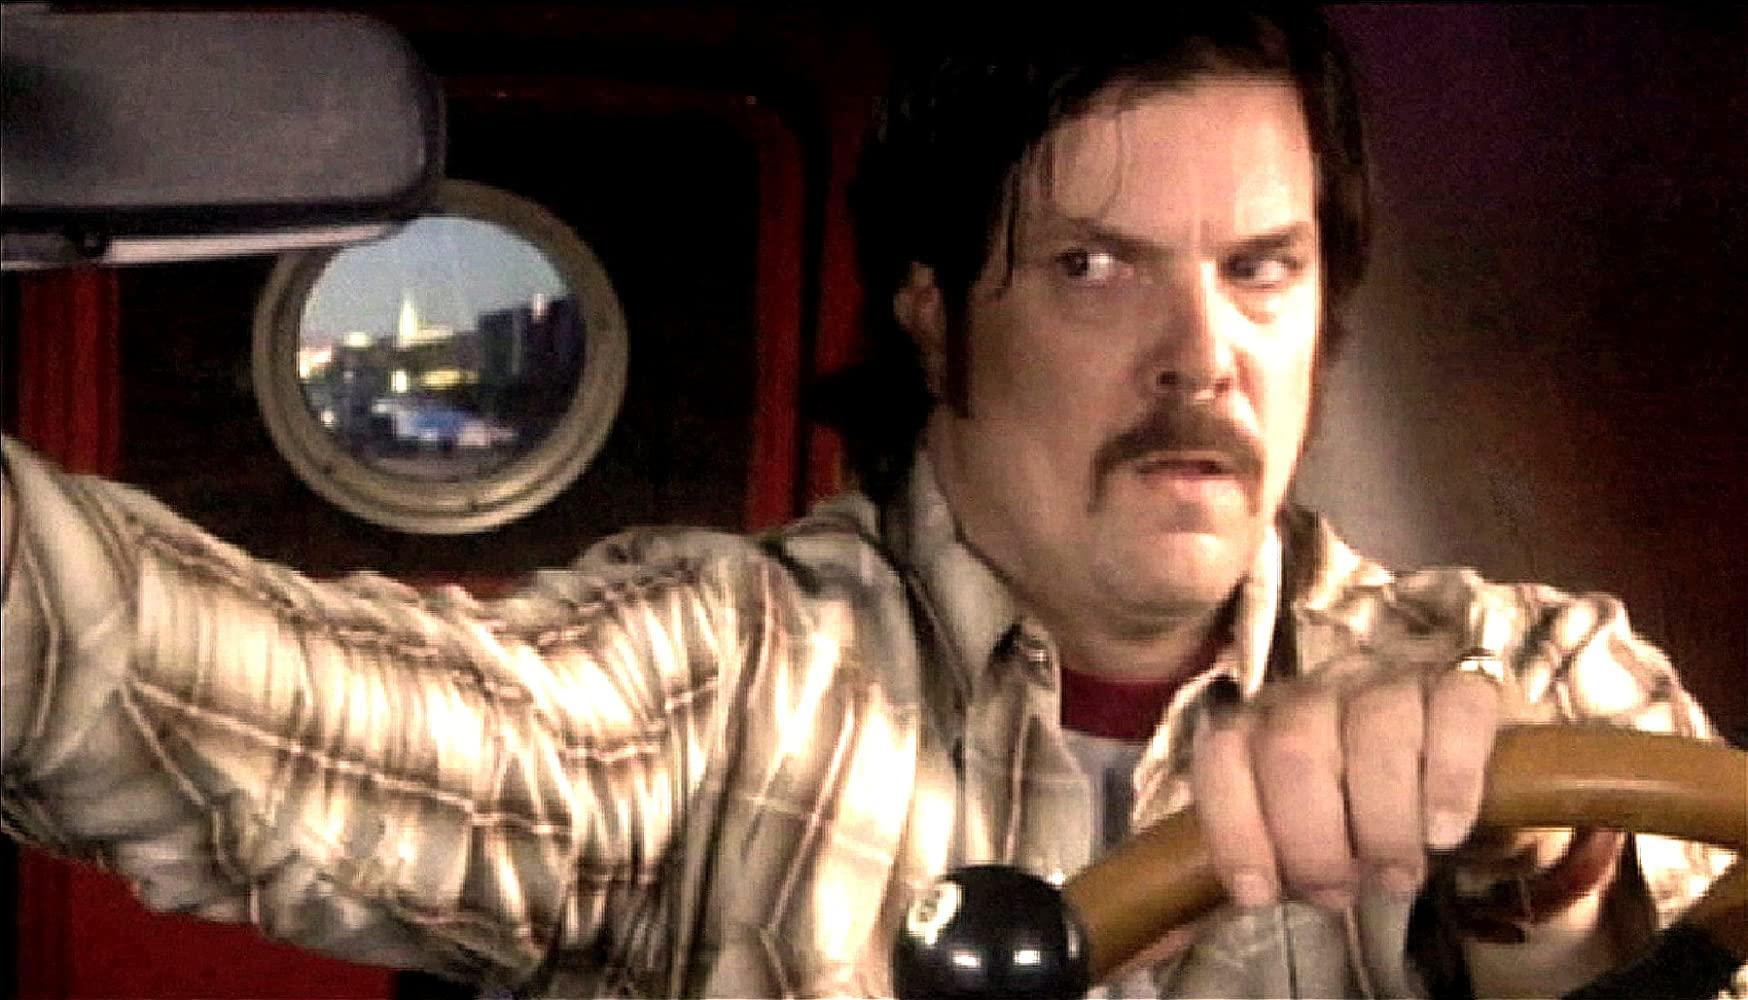 Scott William Leet as true-life serial killer William Bonin in Freeway Killer (2010)